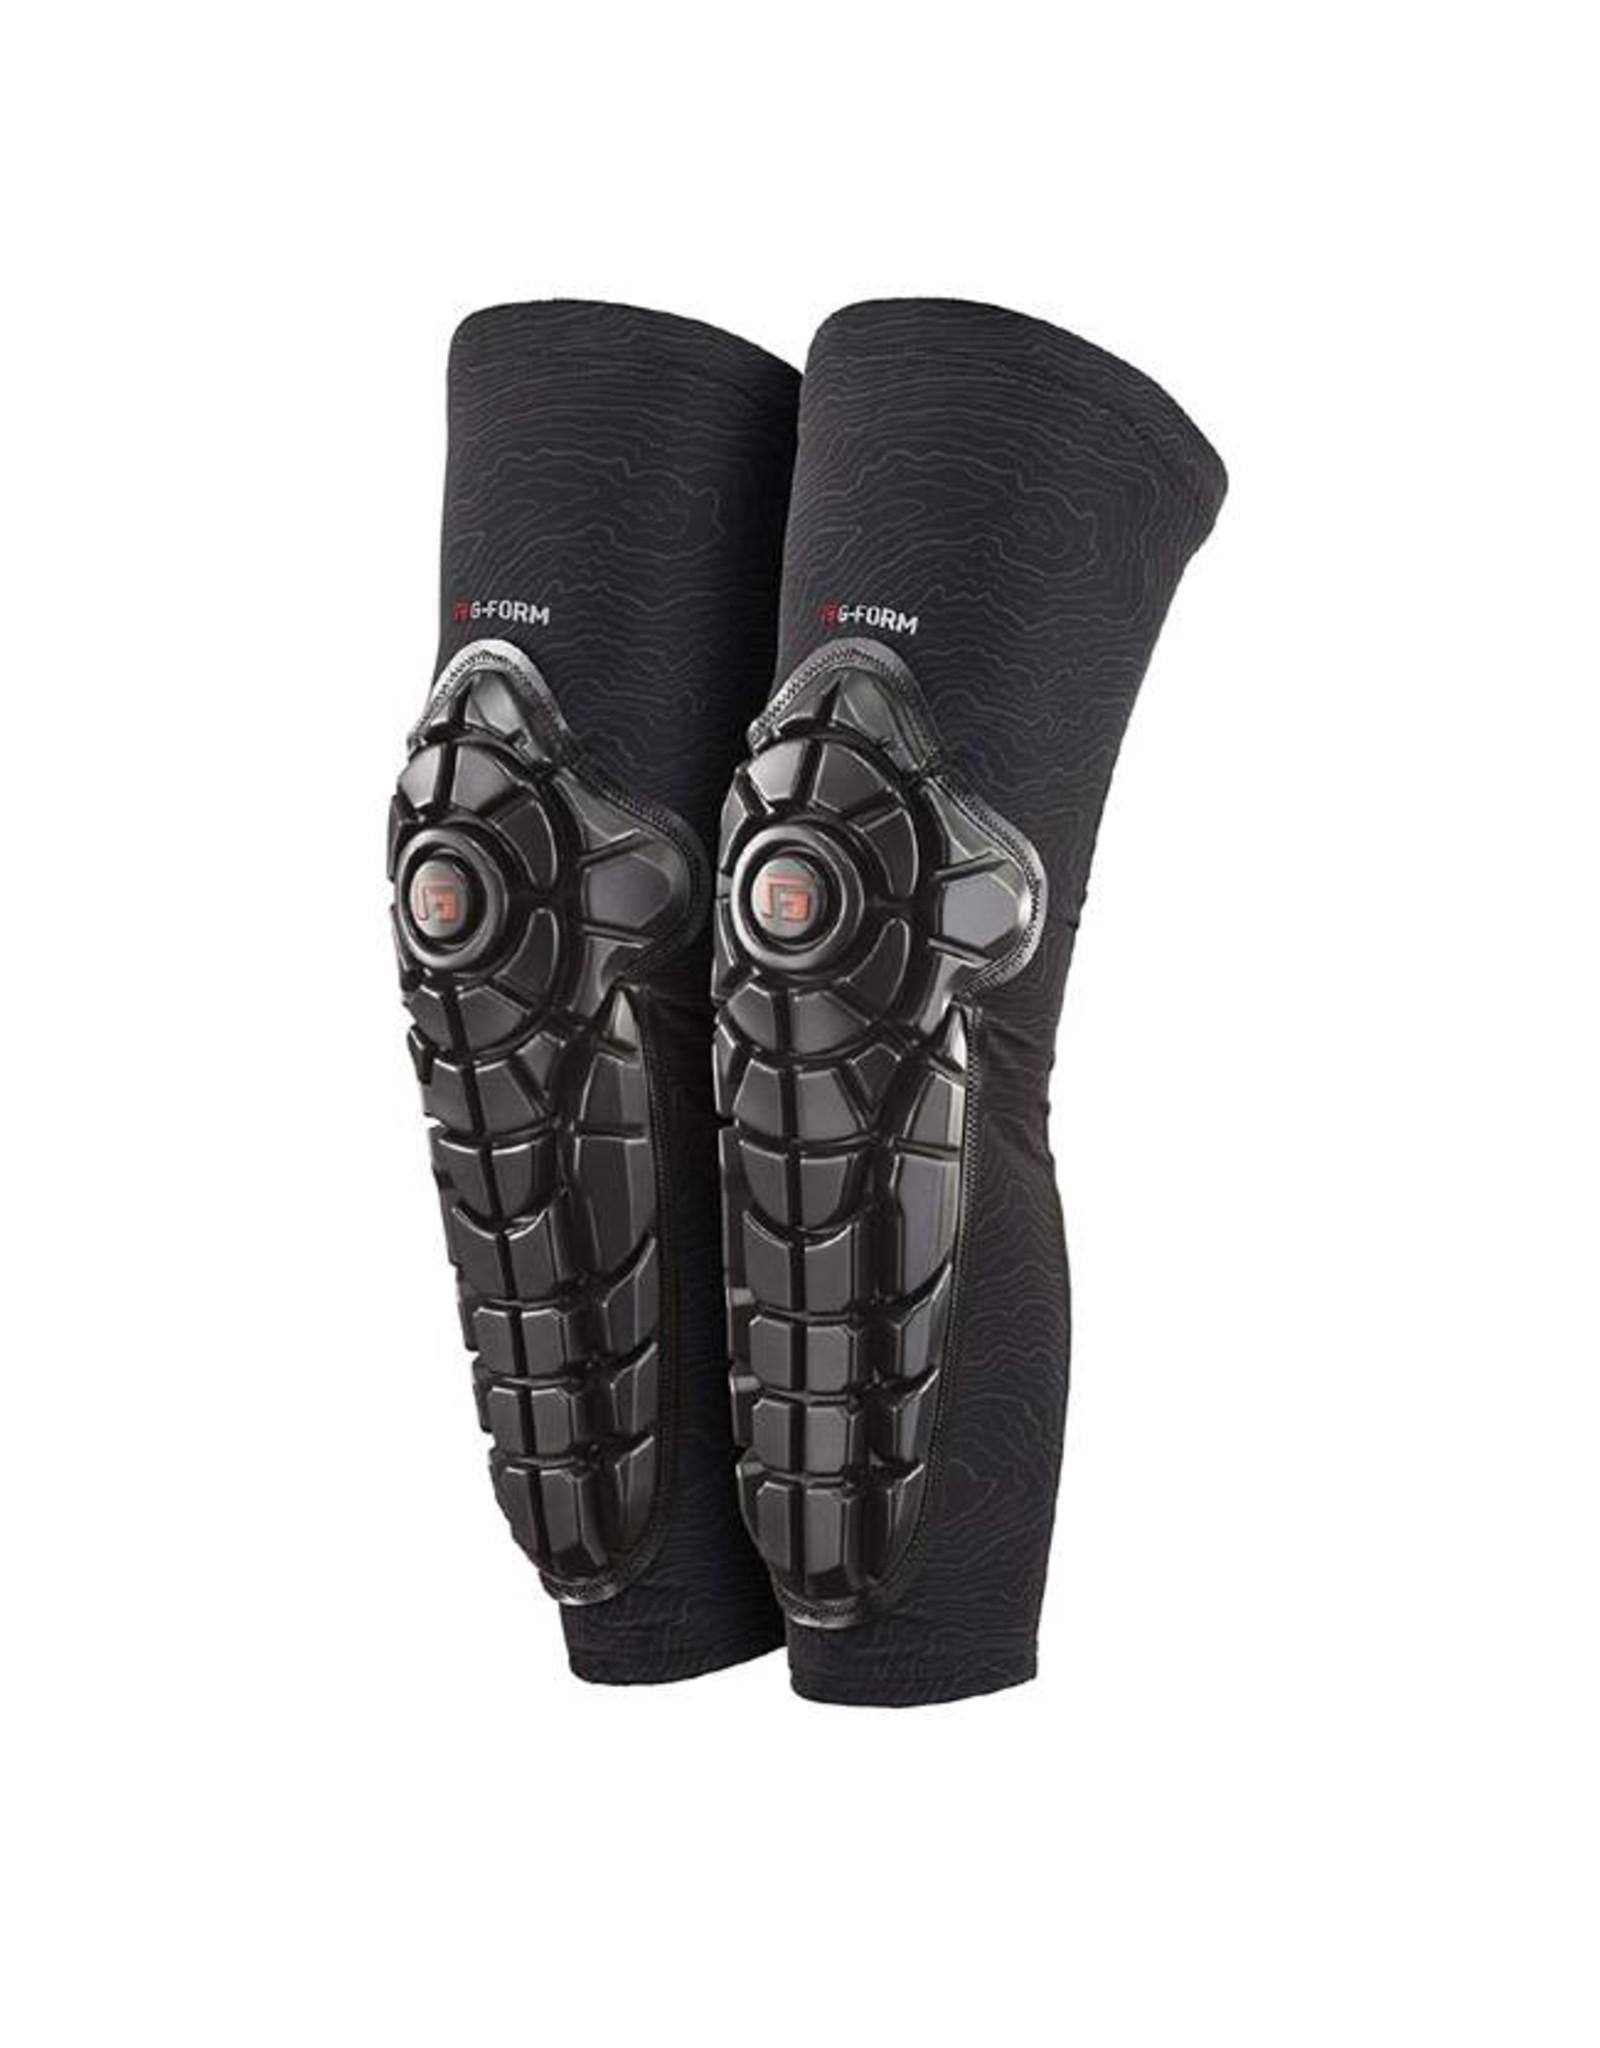 G-Form G-Form Elite Knee-Shin Pad: Black/Topo, MD